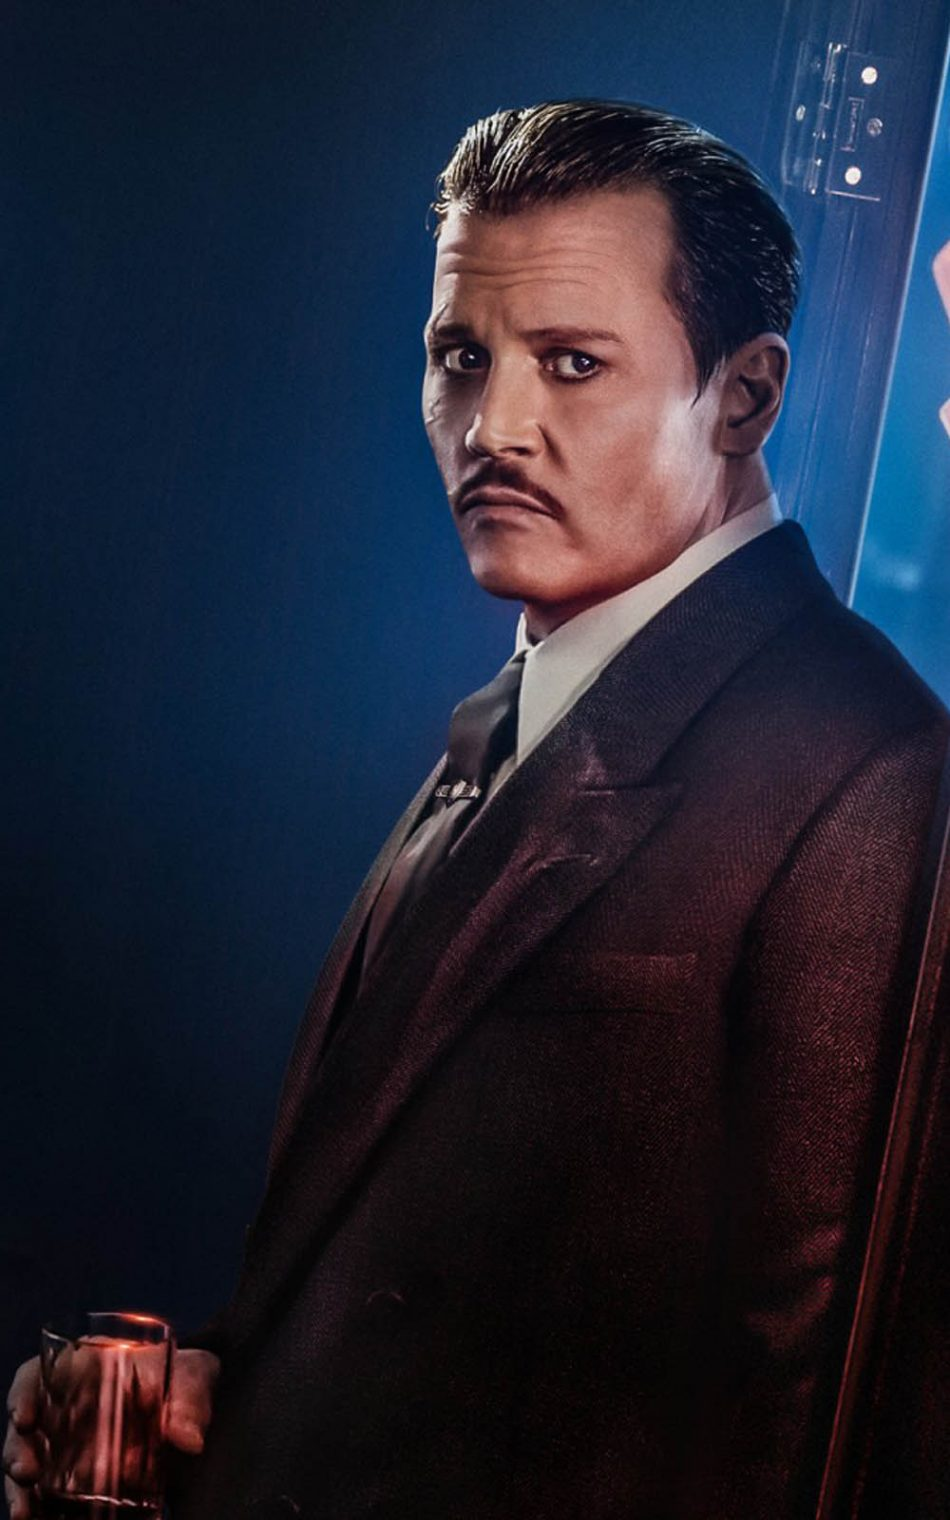 Johnny Depp In Murder On The Orient Express Free 4k Ultra Hd